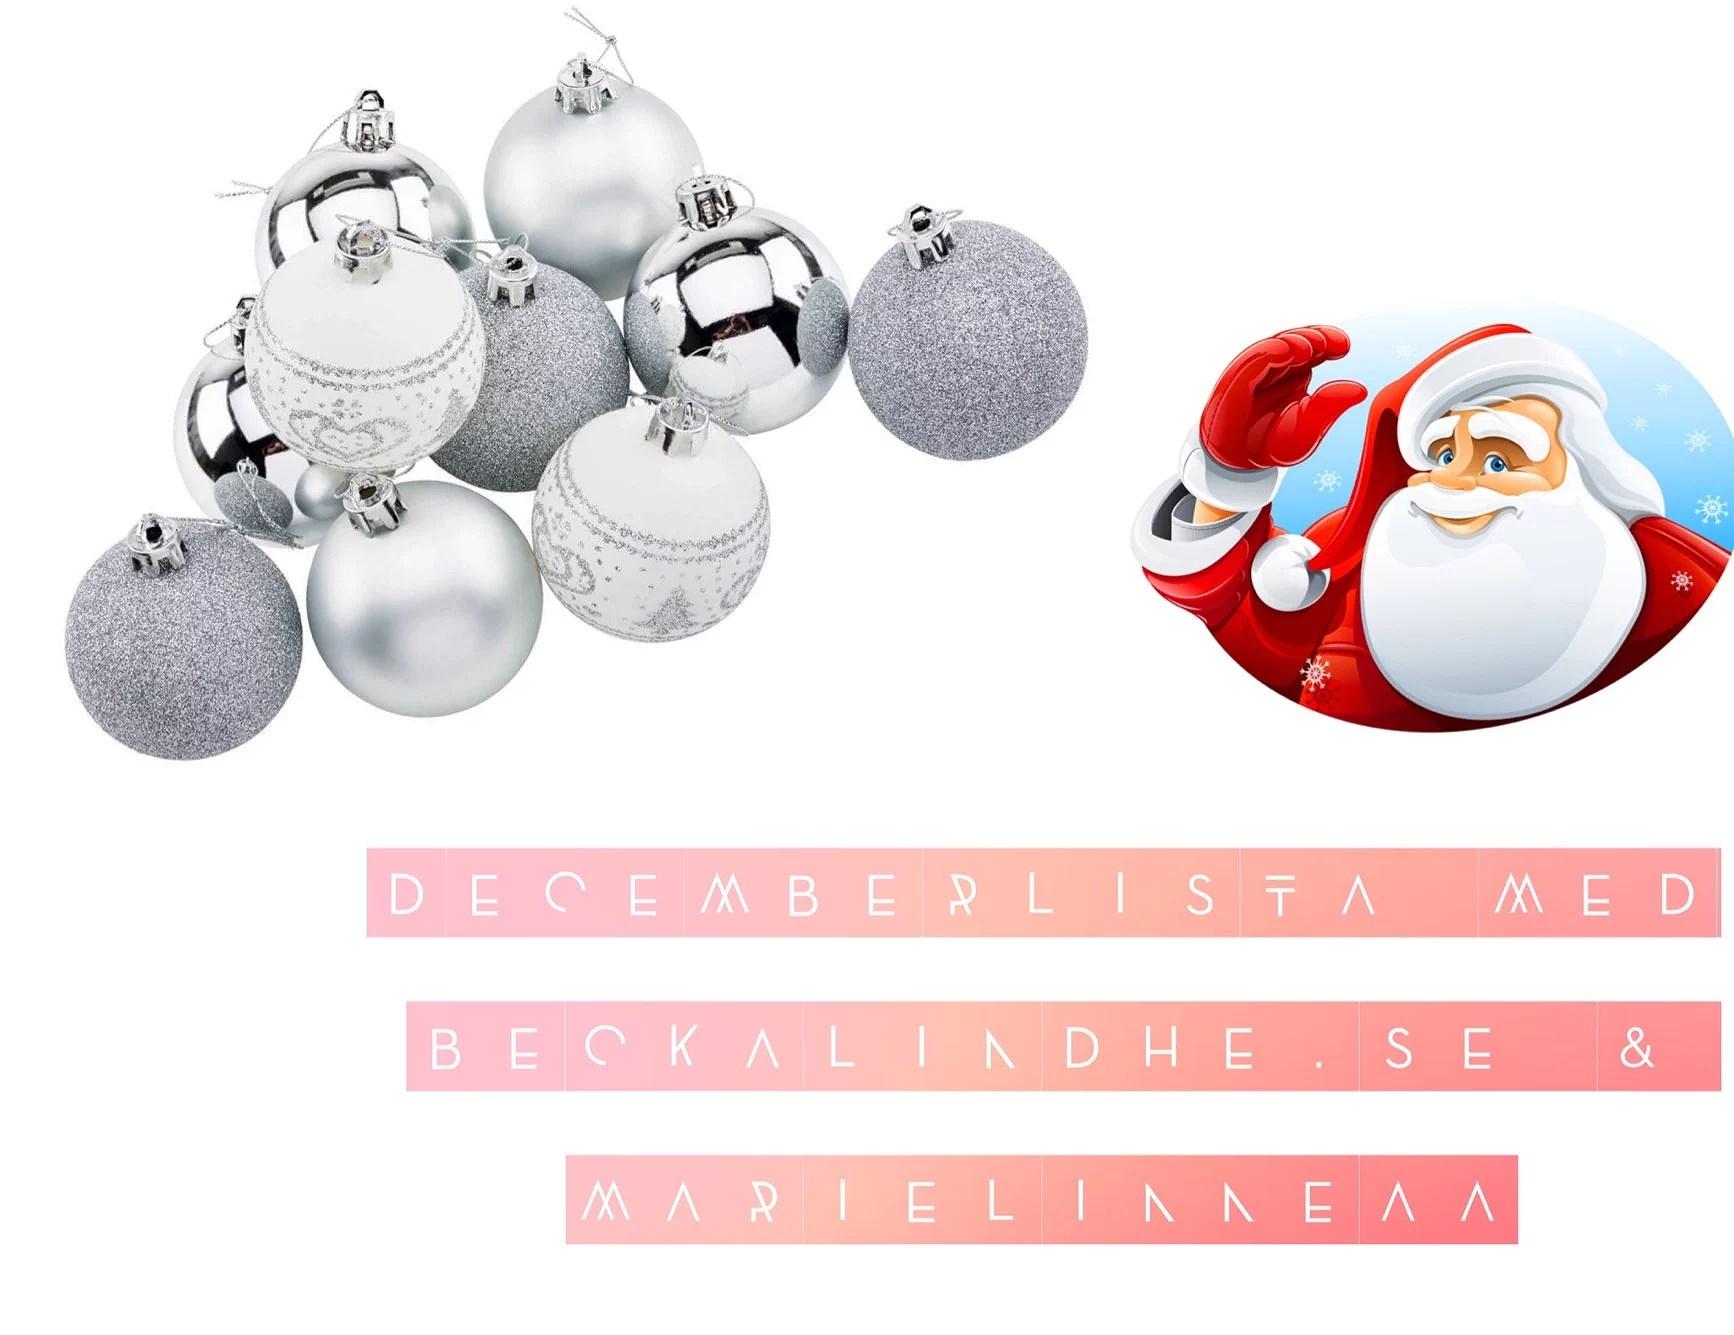 Decemberlista dag 22